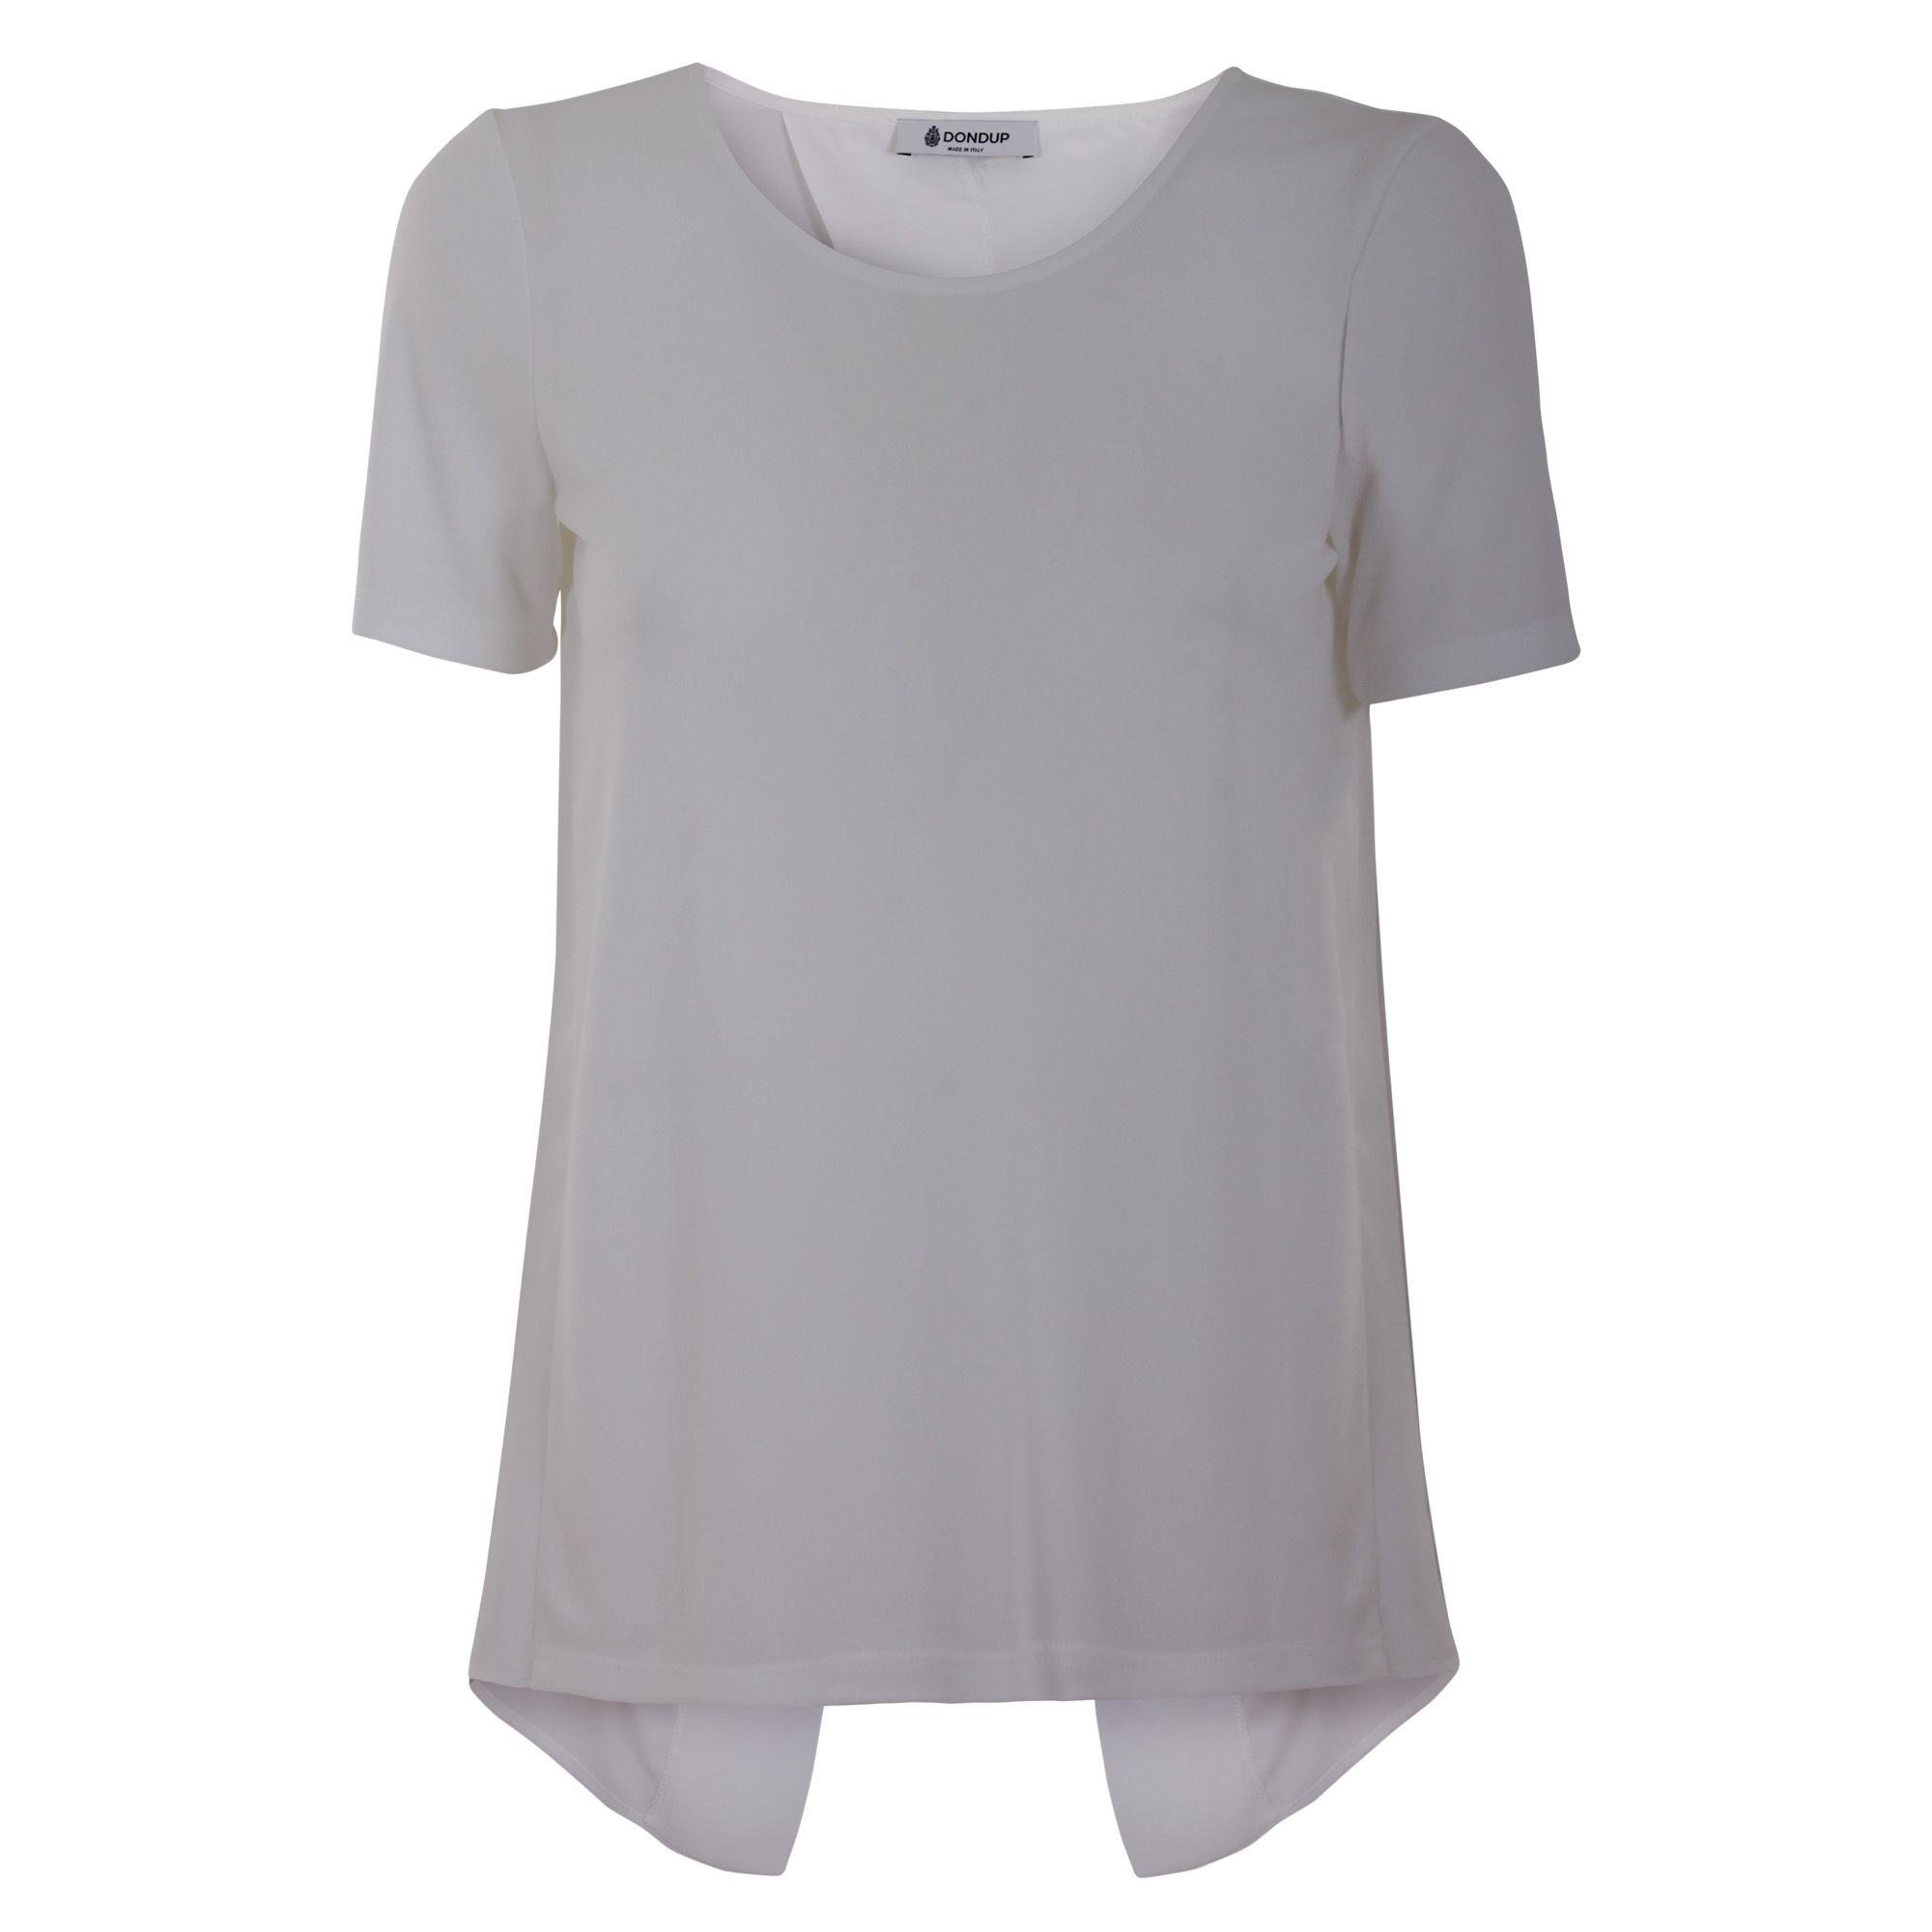 Dondup Maia Viscose Blend T-shirt